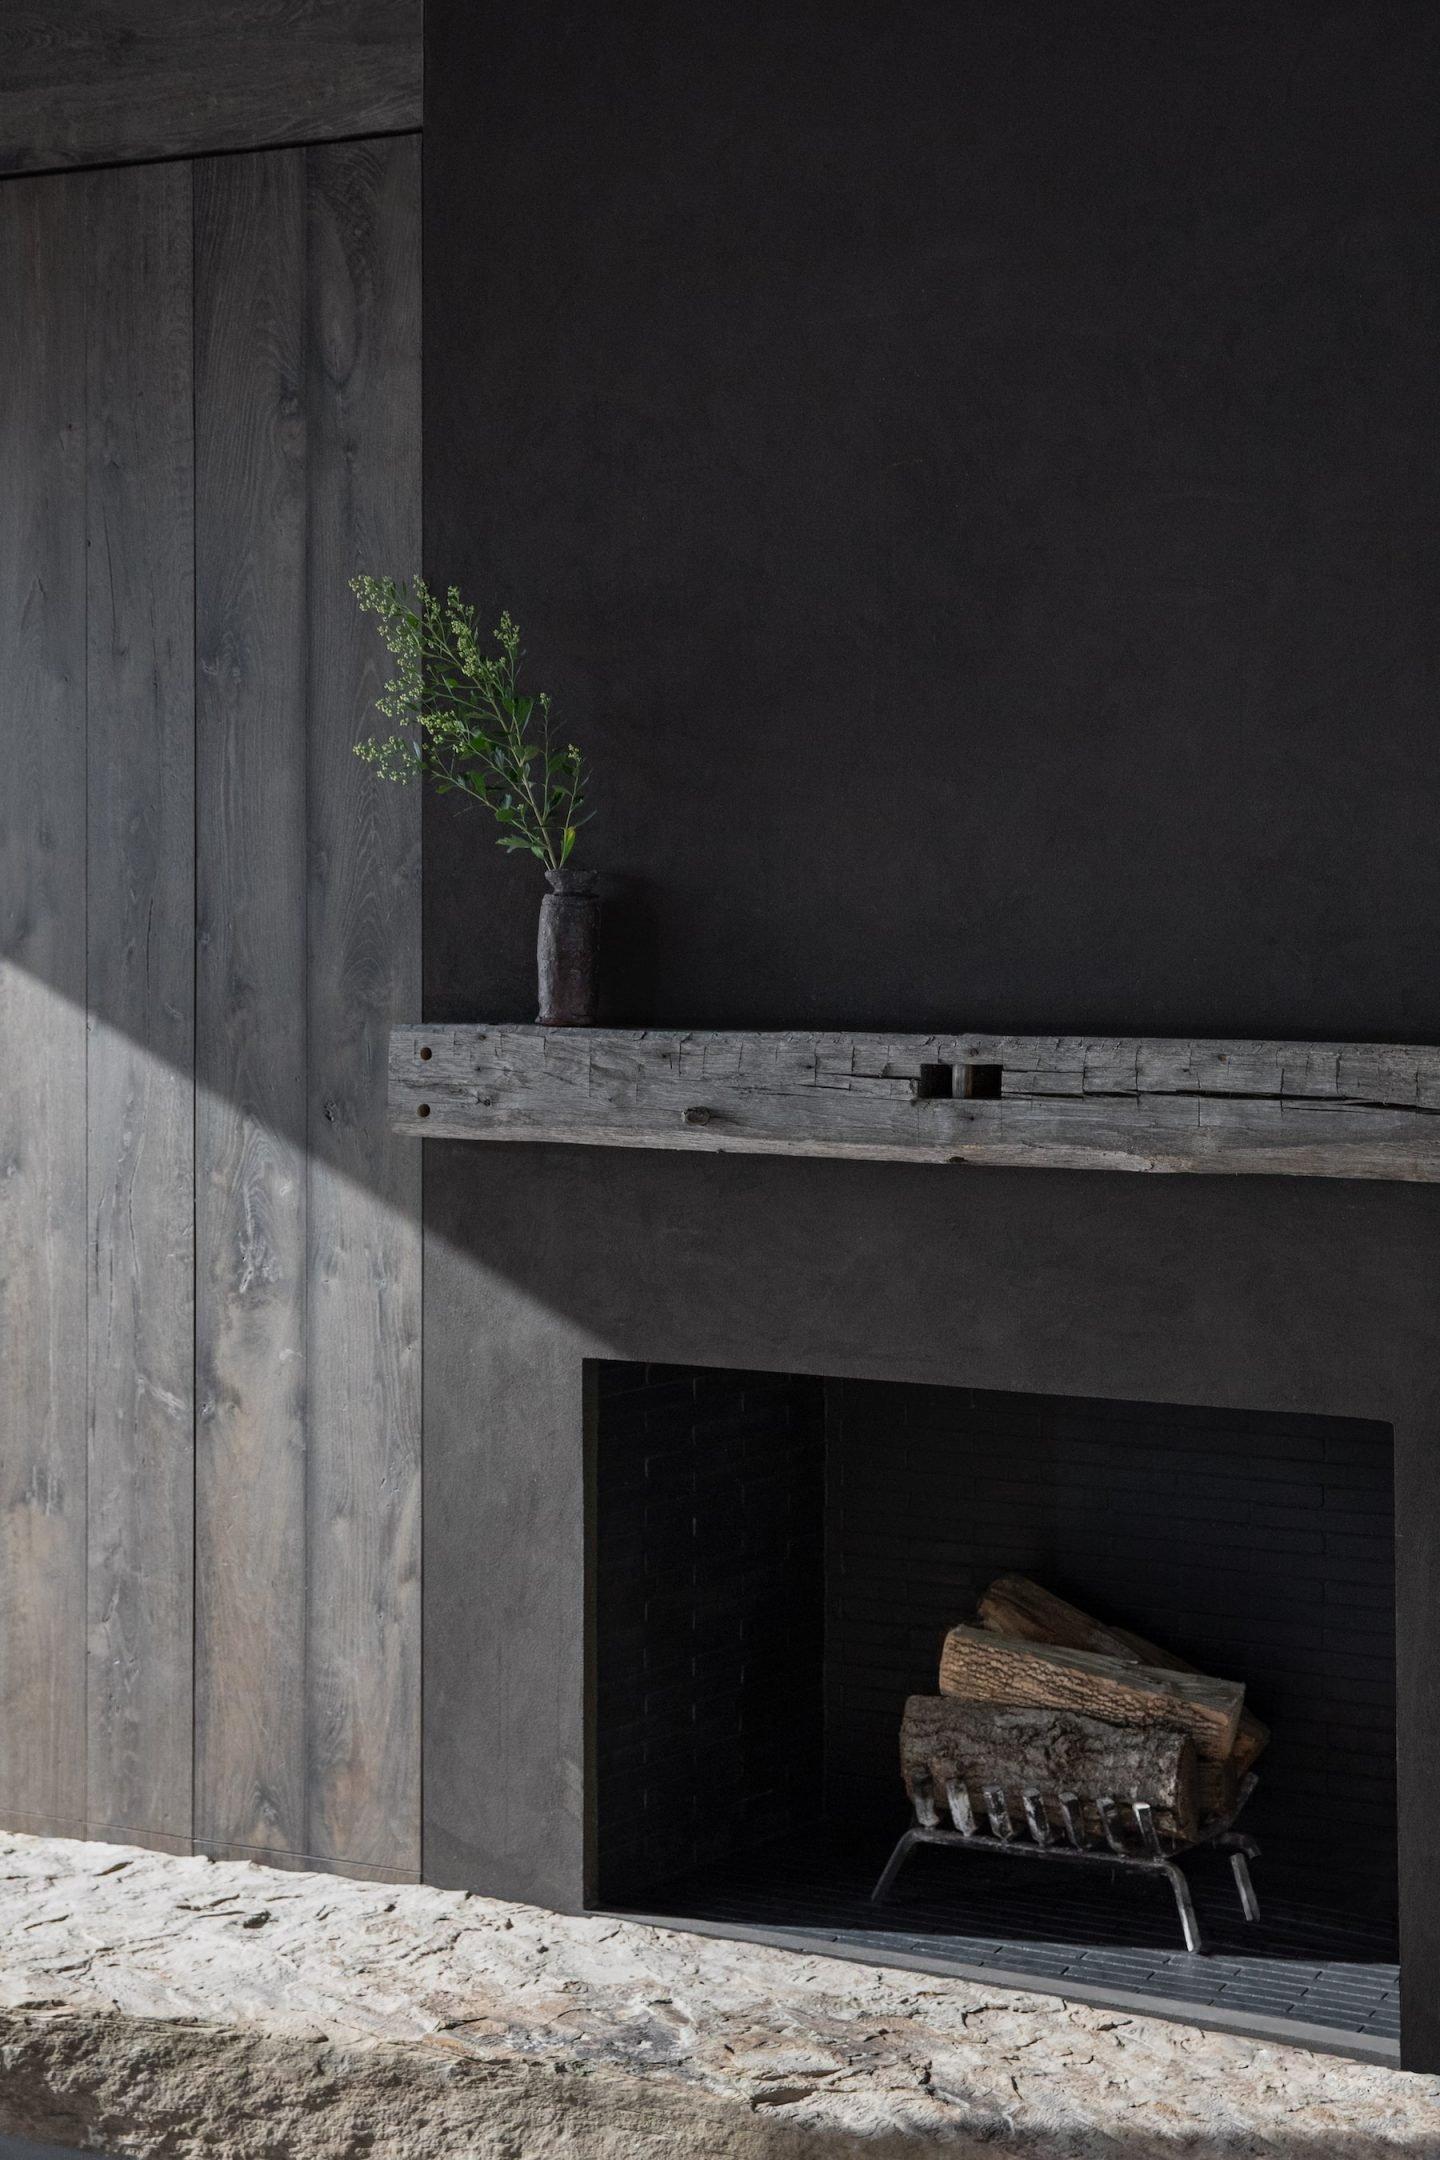 IGNANT-Architecture-Adam-Jordan-Shagwong-Residence-Eric-Petschek-06-min